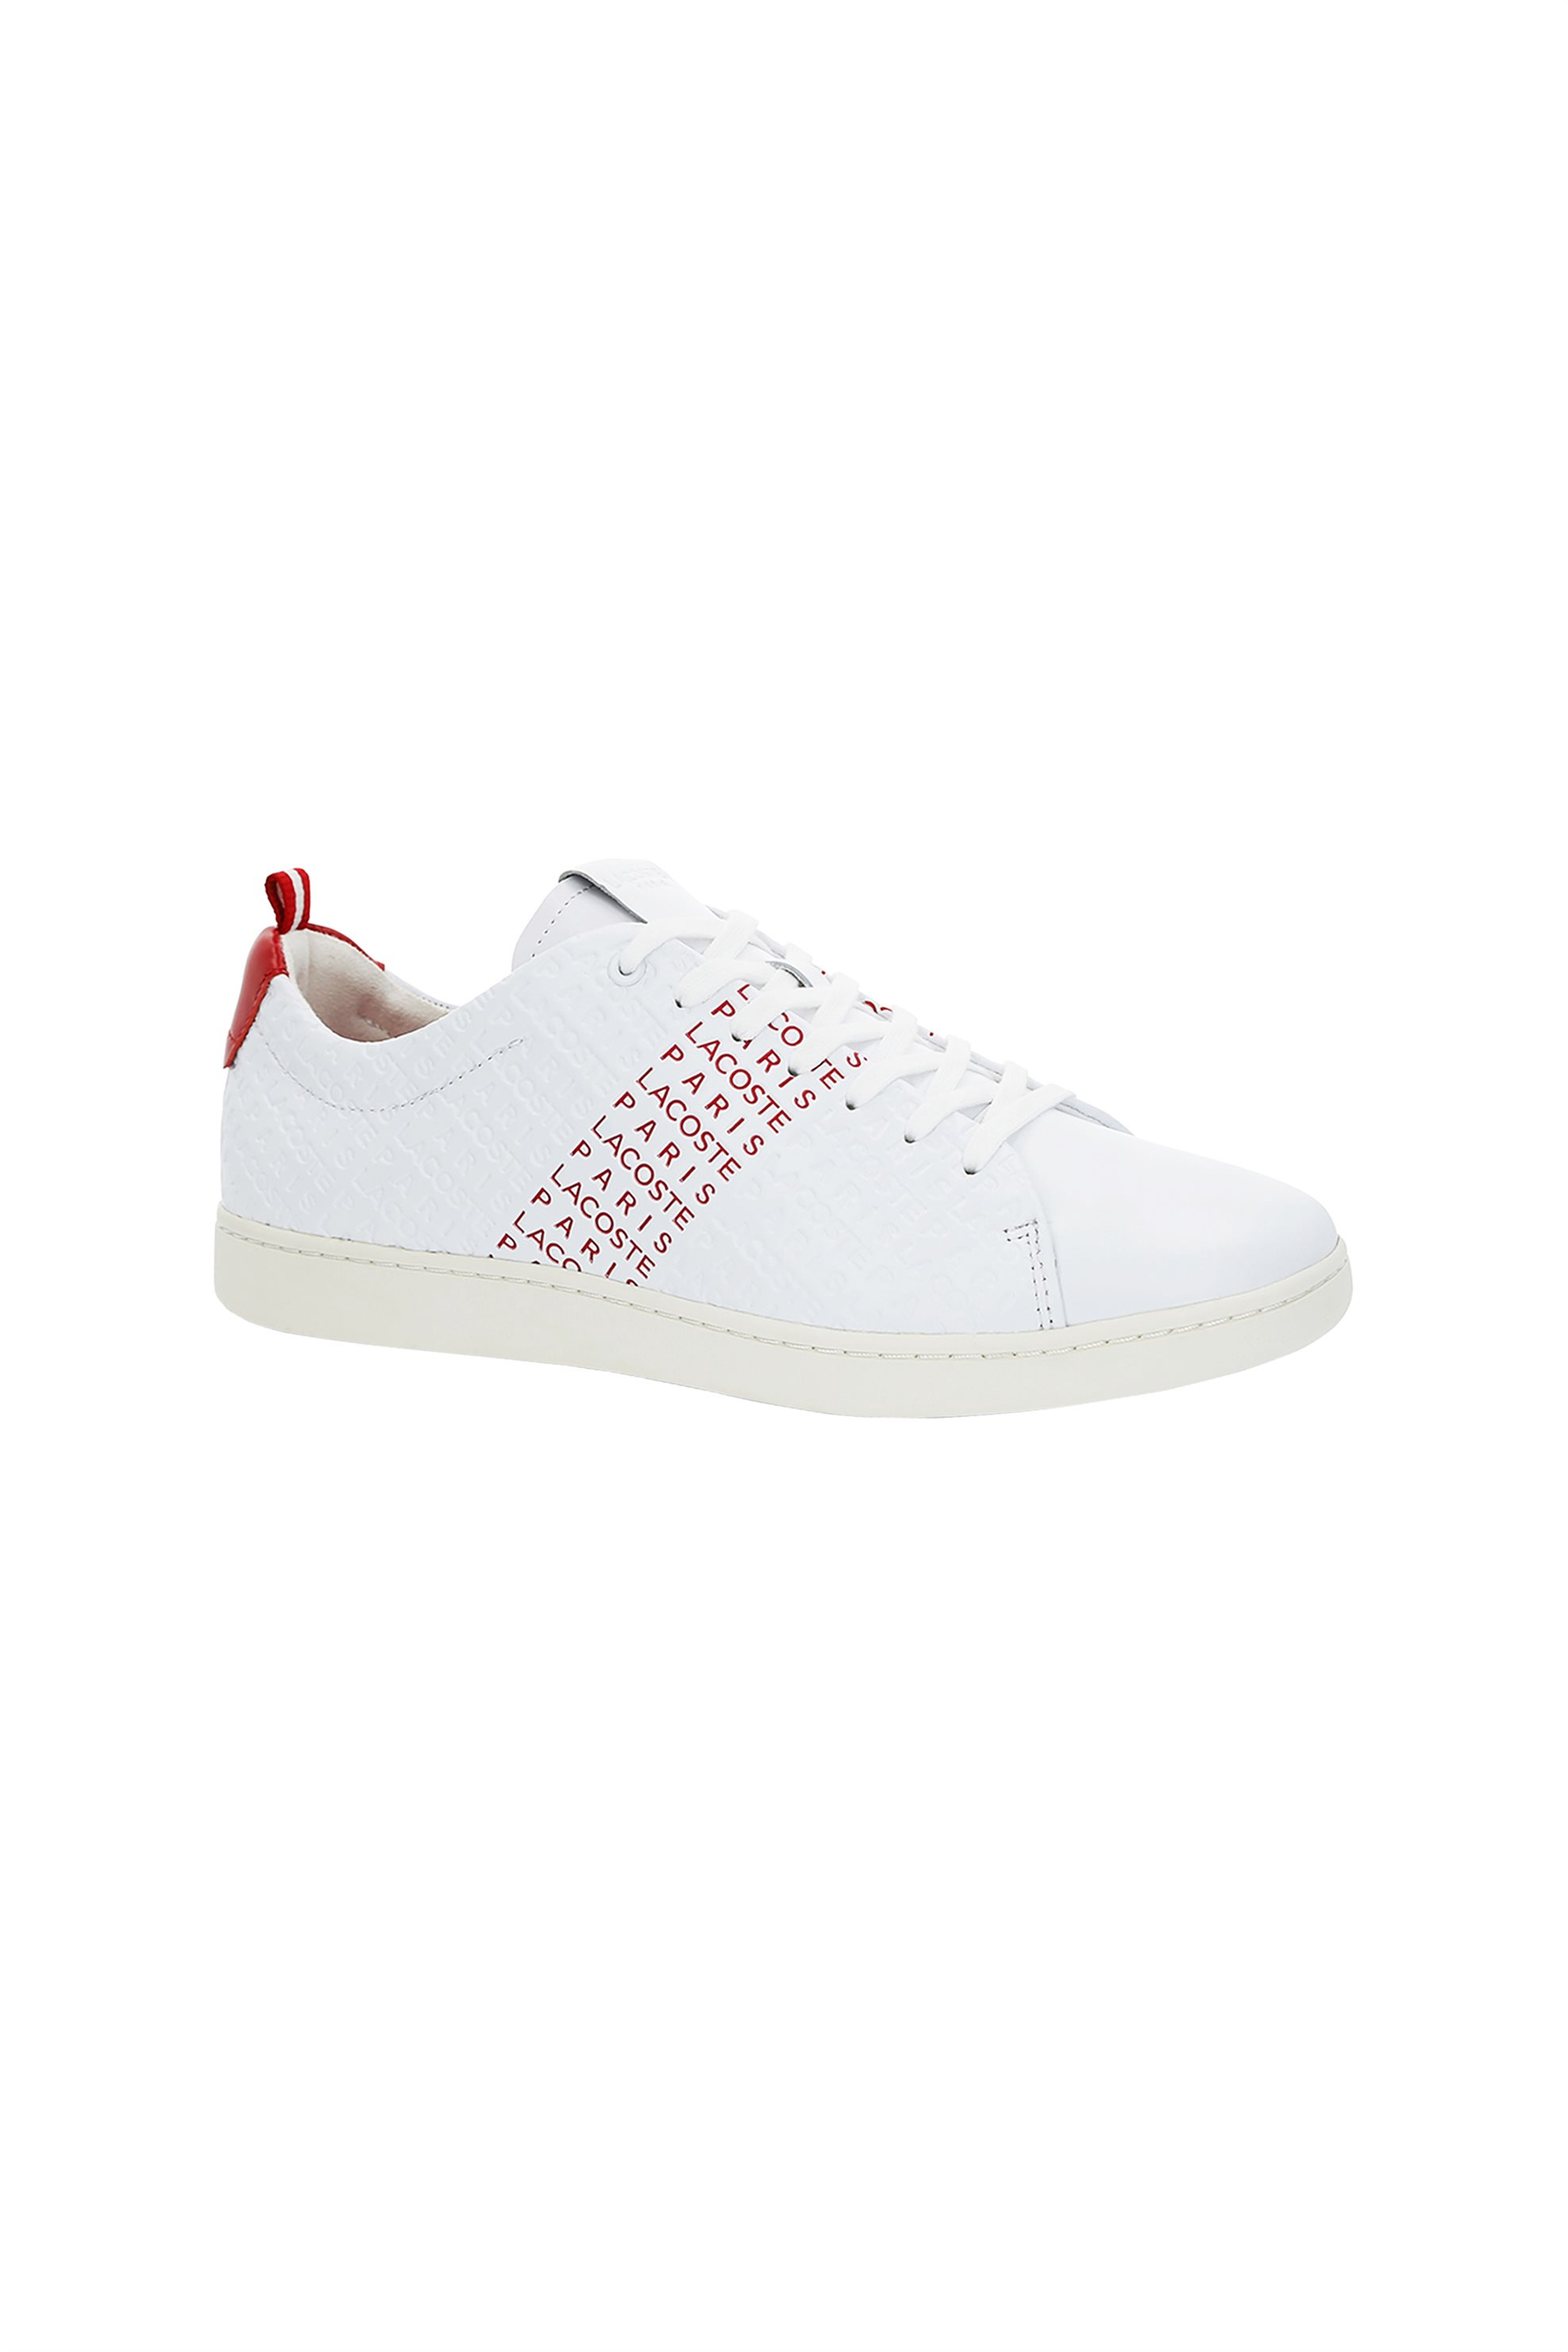 16eafa248128 Notos Lacoste ανδρικά sneakers με λεπτομέρειες σε κόκκινο χρώμα Carnaby Evo  – 37SMA0014286 – Λευκό